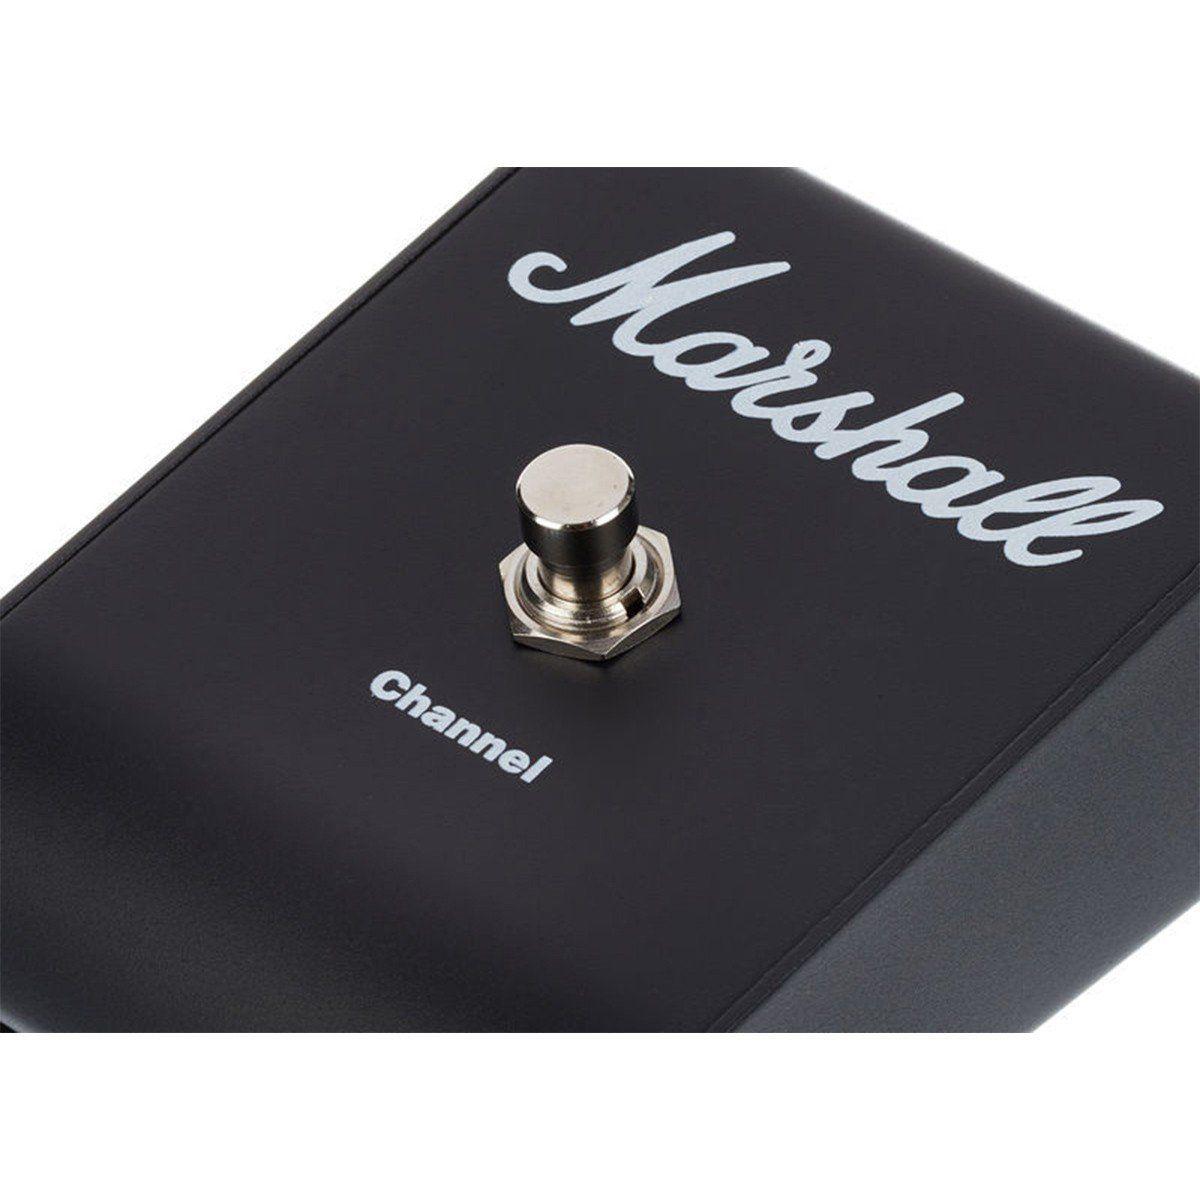 Marshall PEDL-90003 FootSwitch Pedal para Troca de Canal de Amplificador